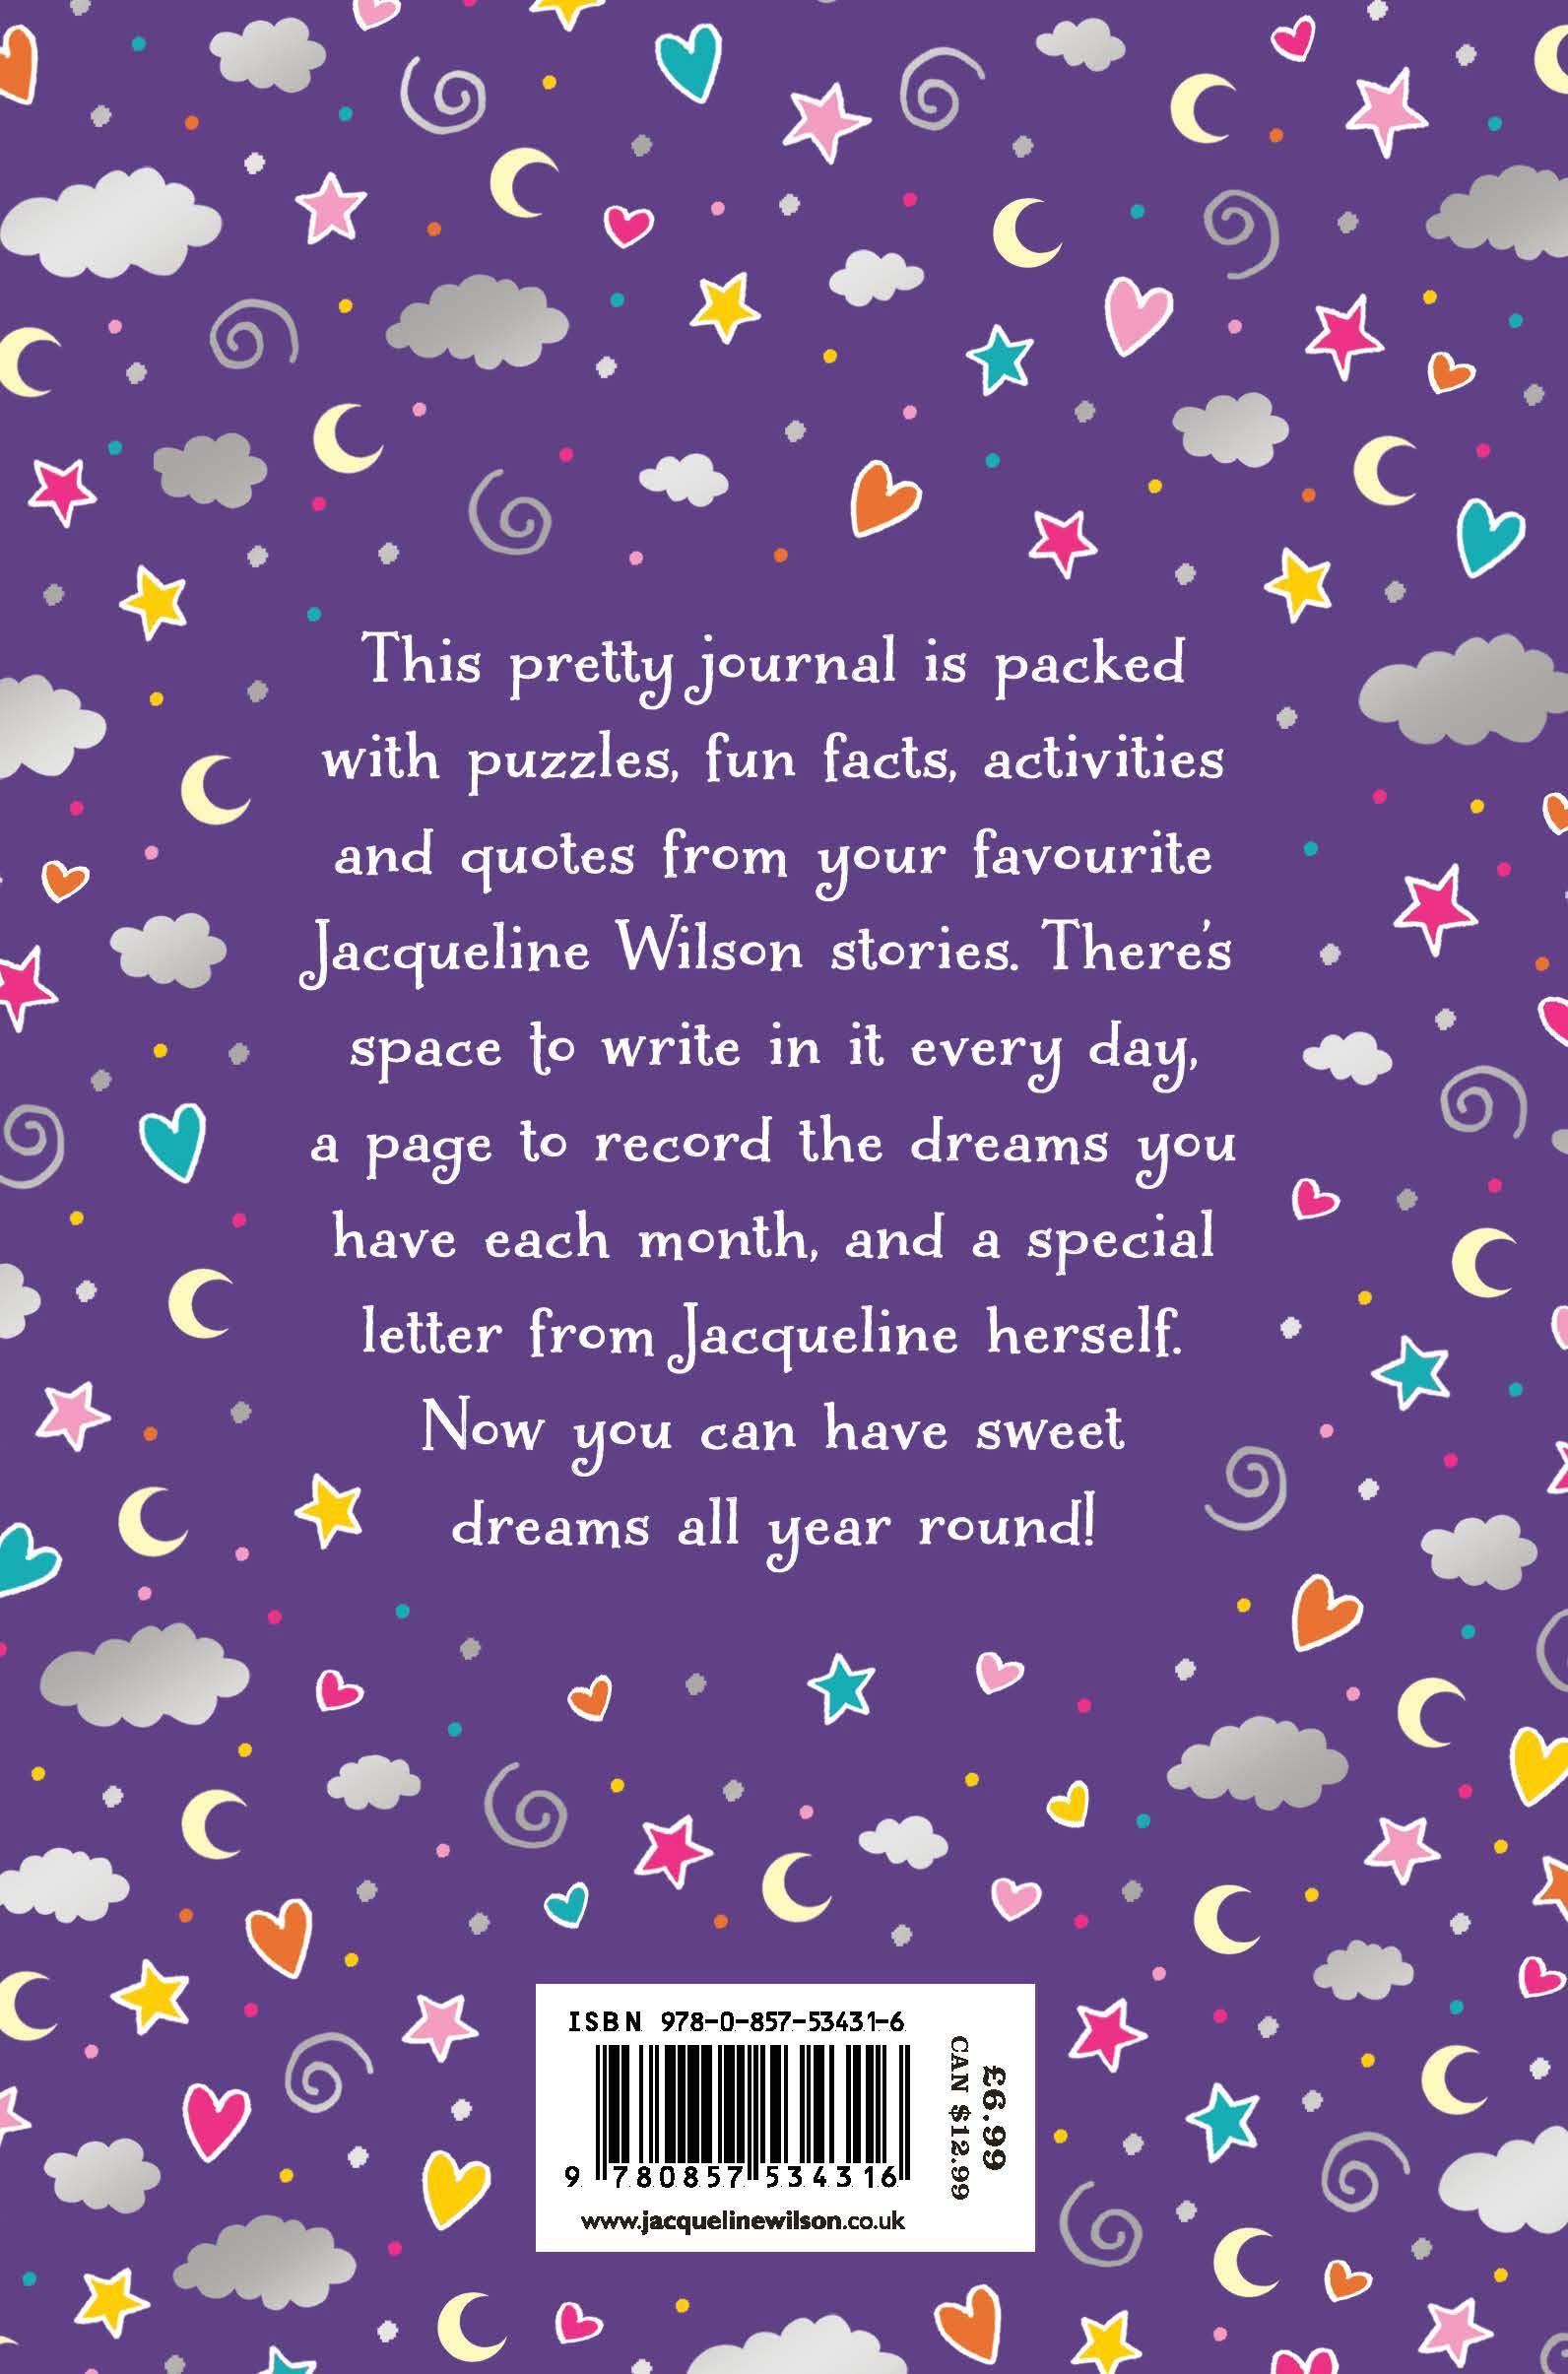 Jacqueline Wilson Dream Journal Jacqueline Wilson 9780857534316